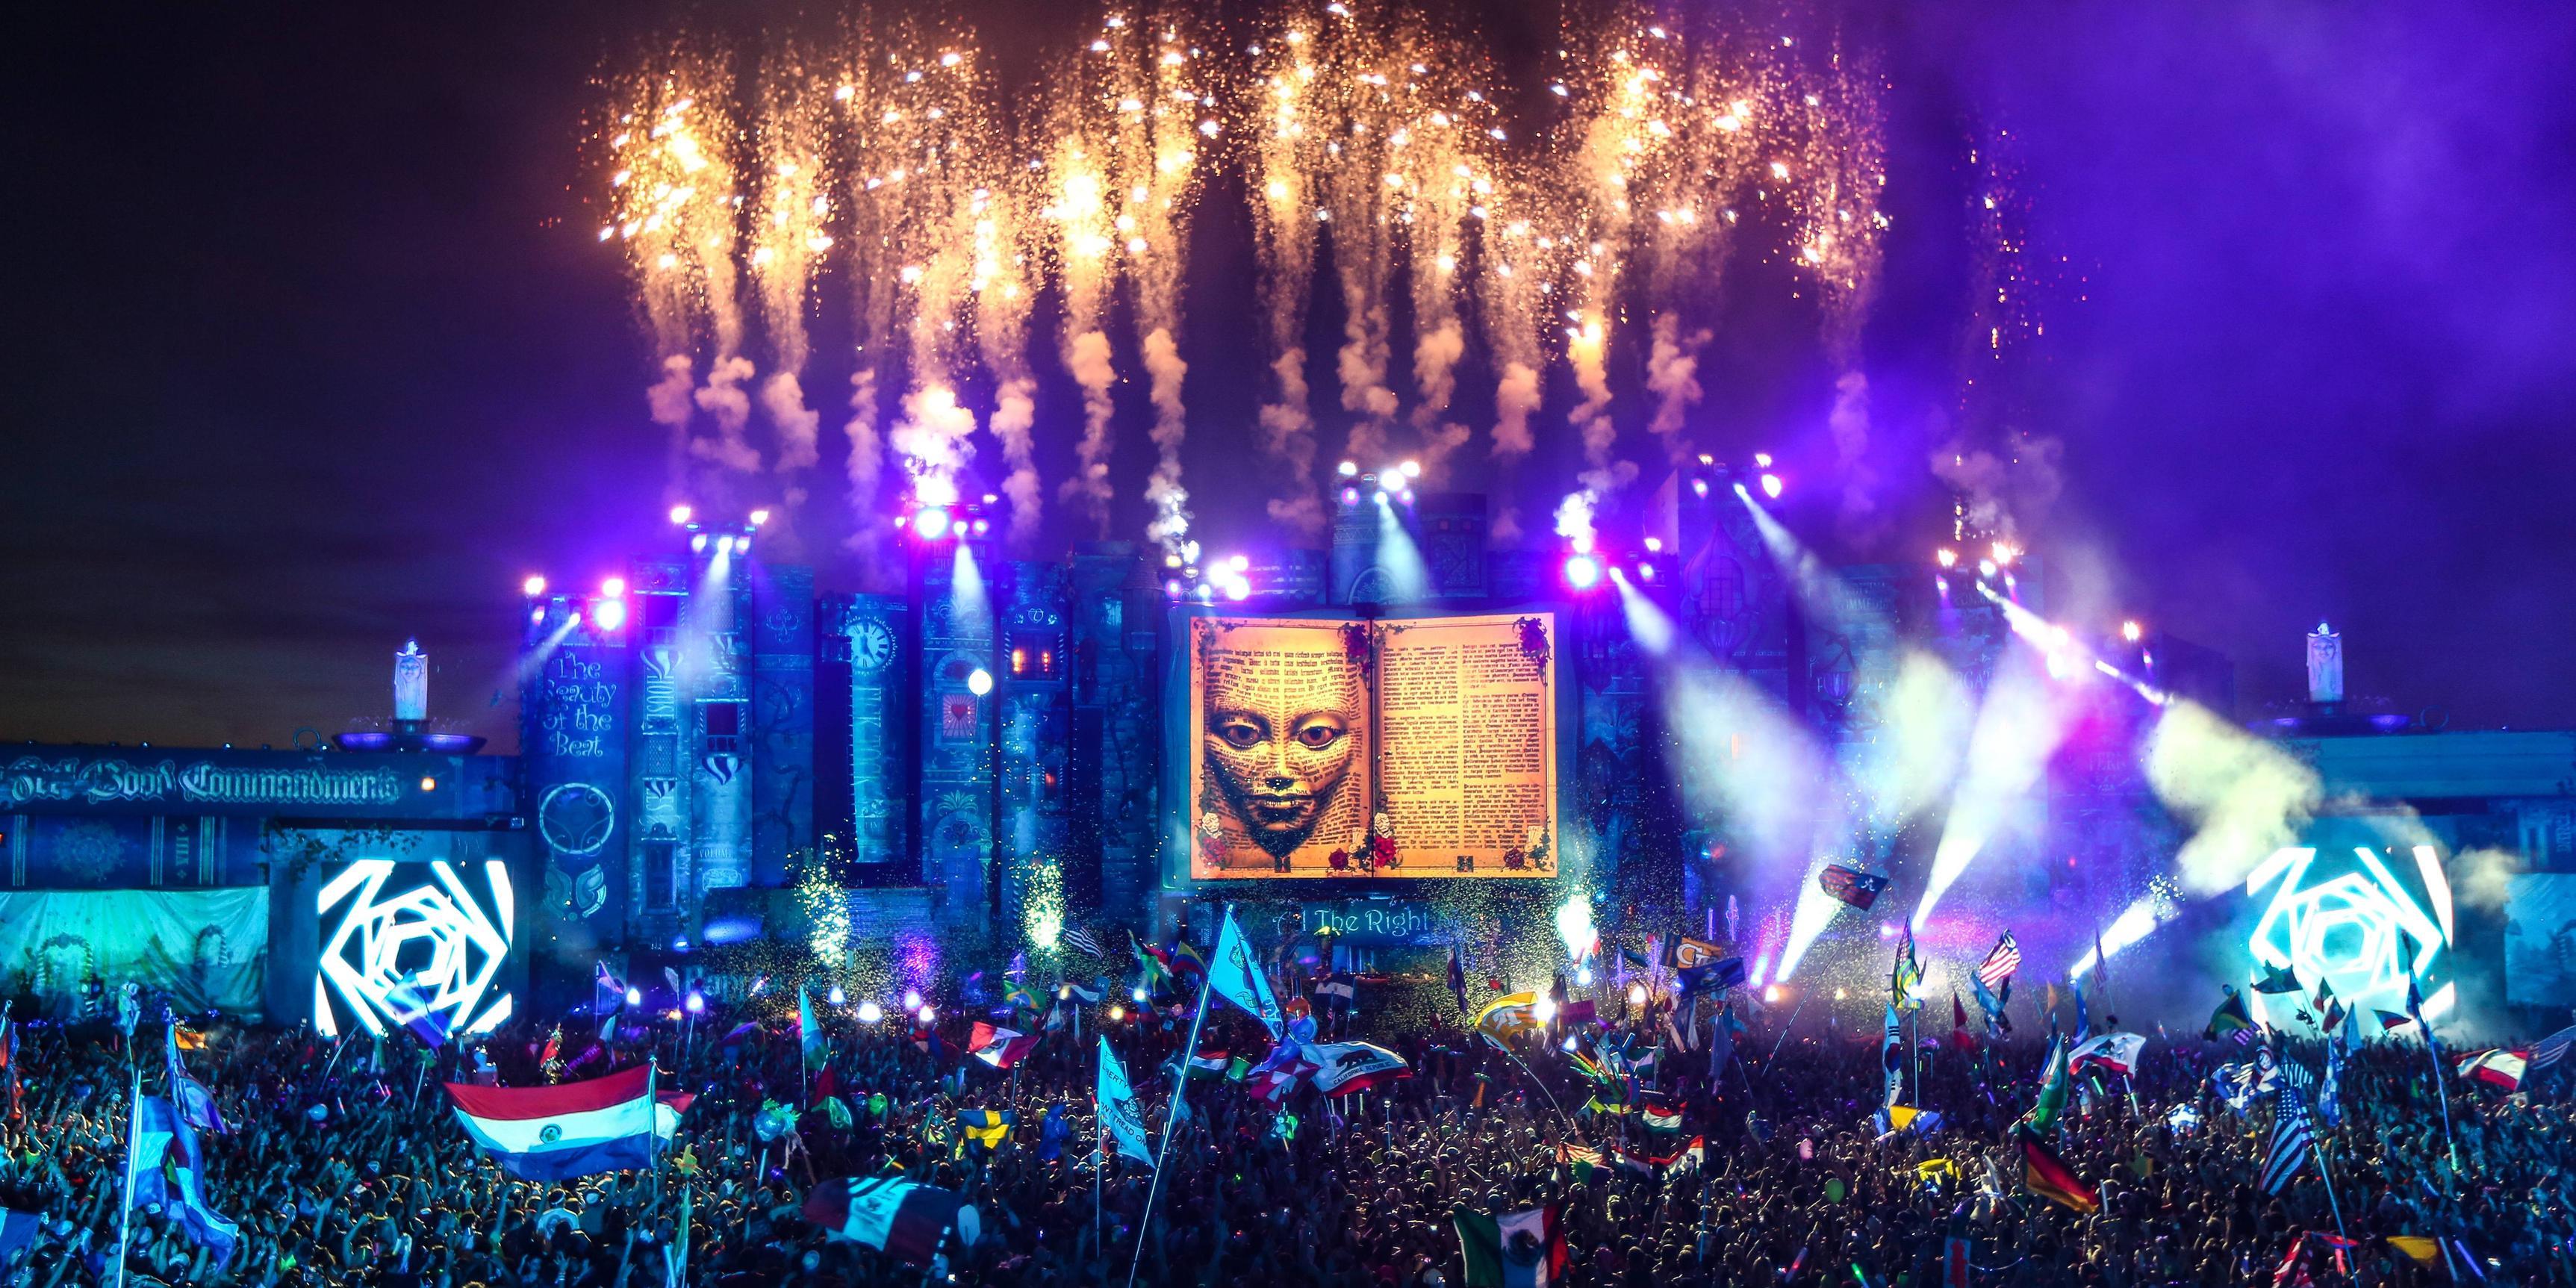 Фестиваль 2015